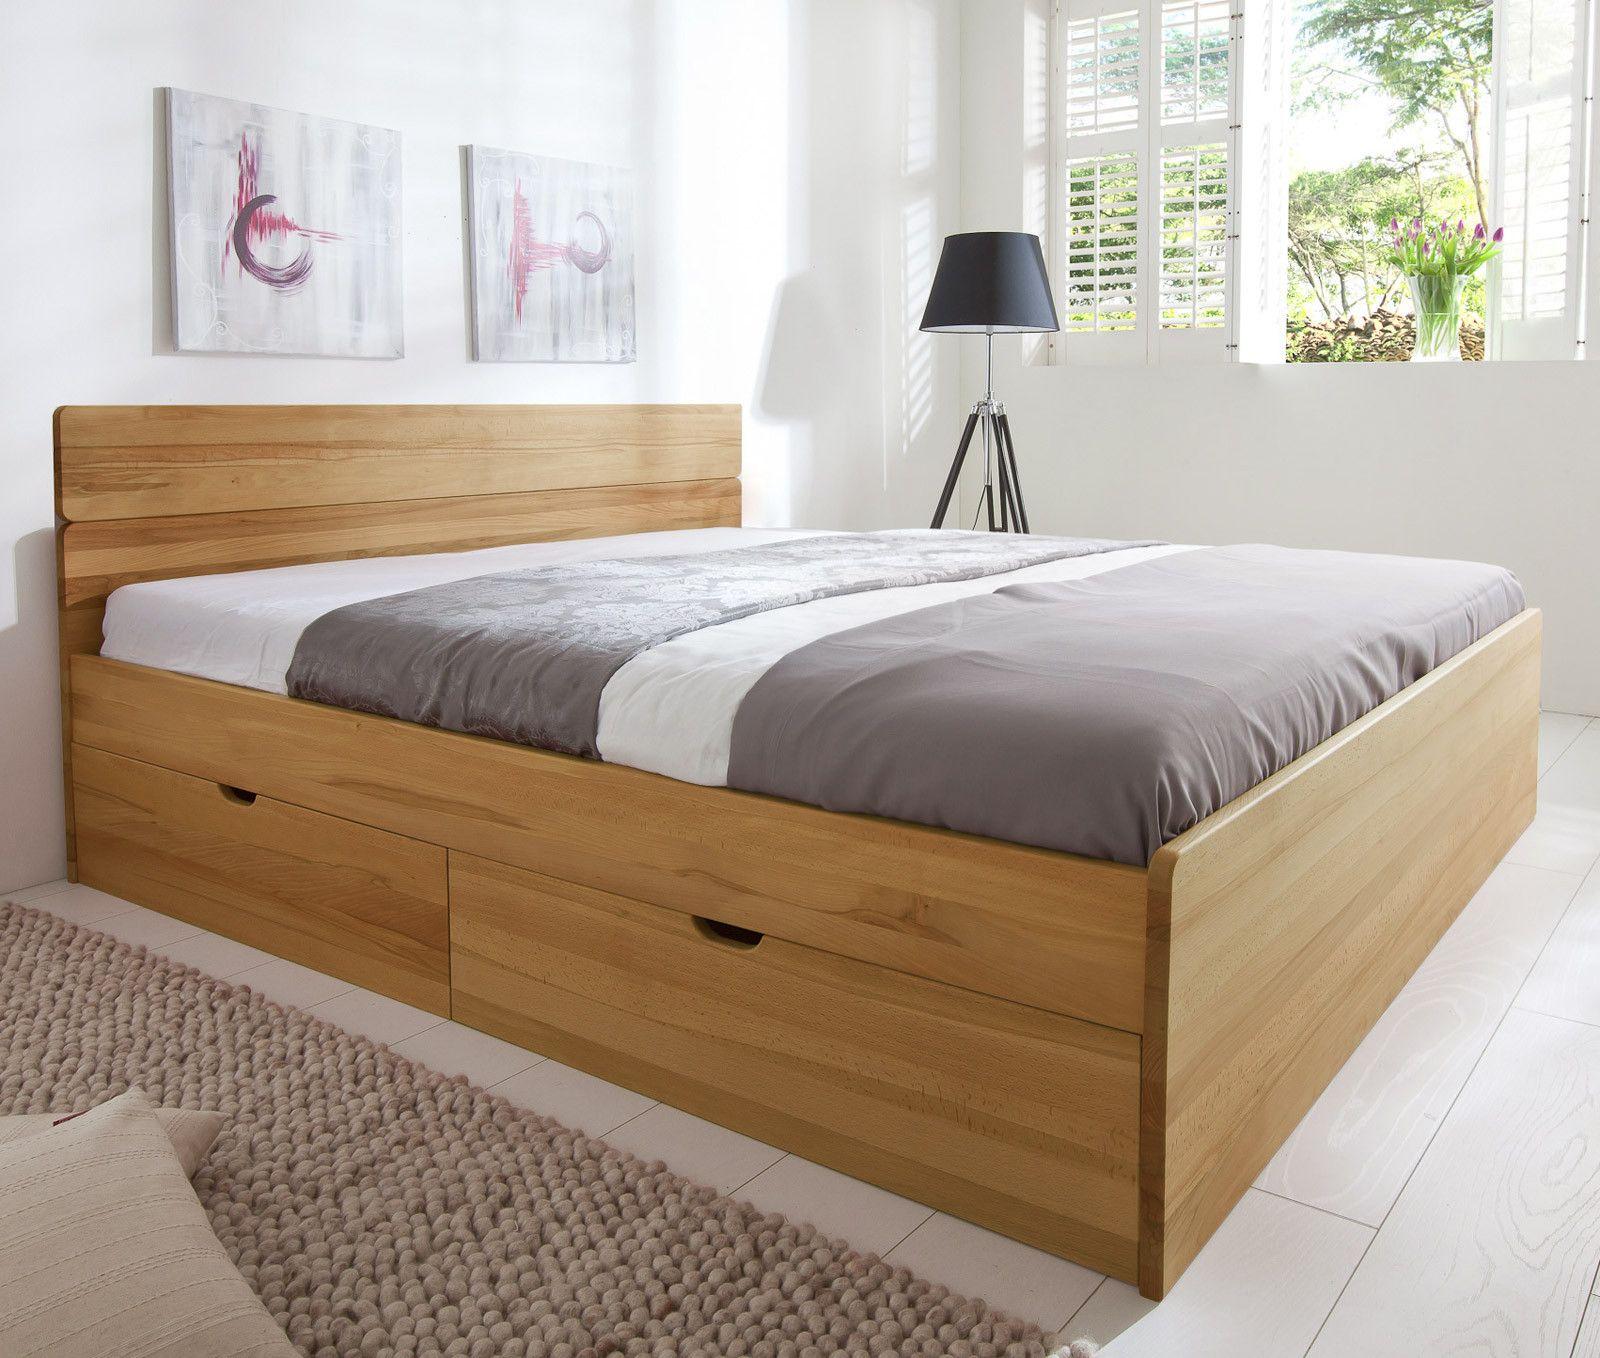 Bett Stauraum Fresh Bett Mit Schubkasten In Der Grosse 180x200cm Finnland Dengan Gambar Tempat Tidur Laci Tempat Tidur Tidur